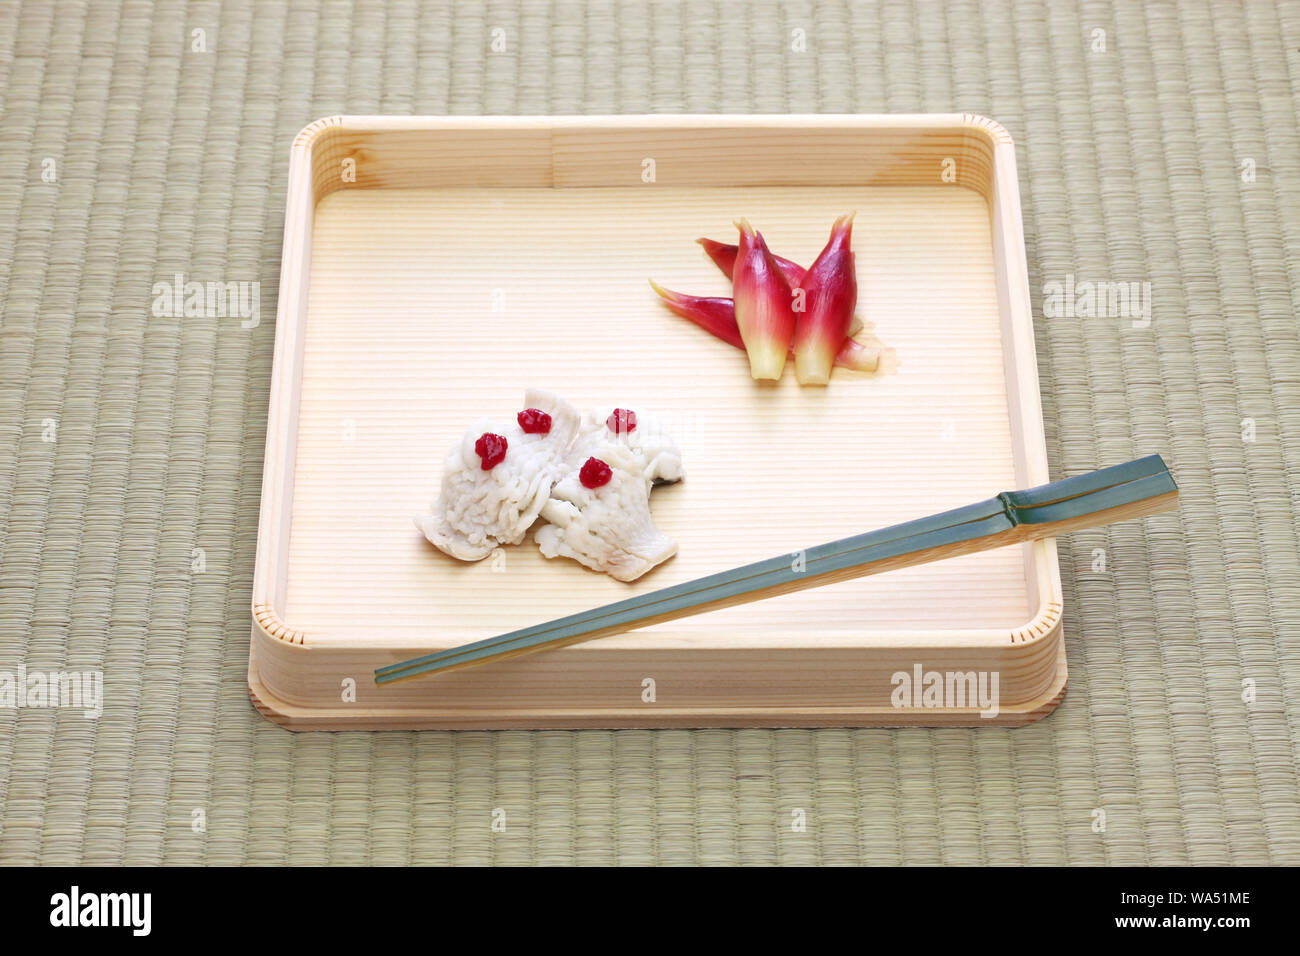 Hassun, assorted tidbits for Japanese tea ceremony cuisine on tatami mat. Stock Photo